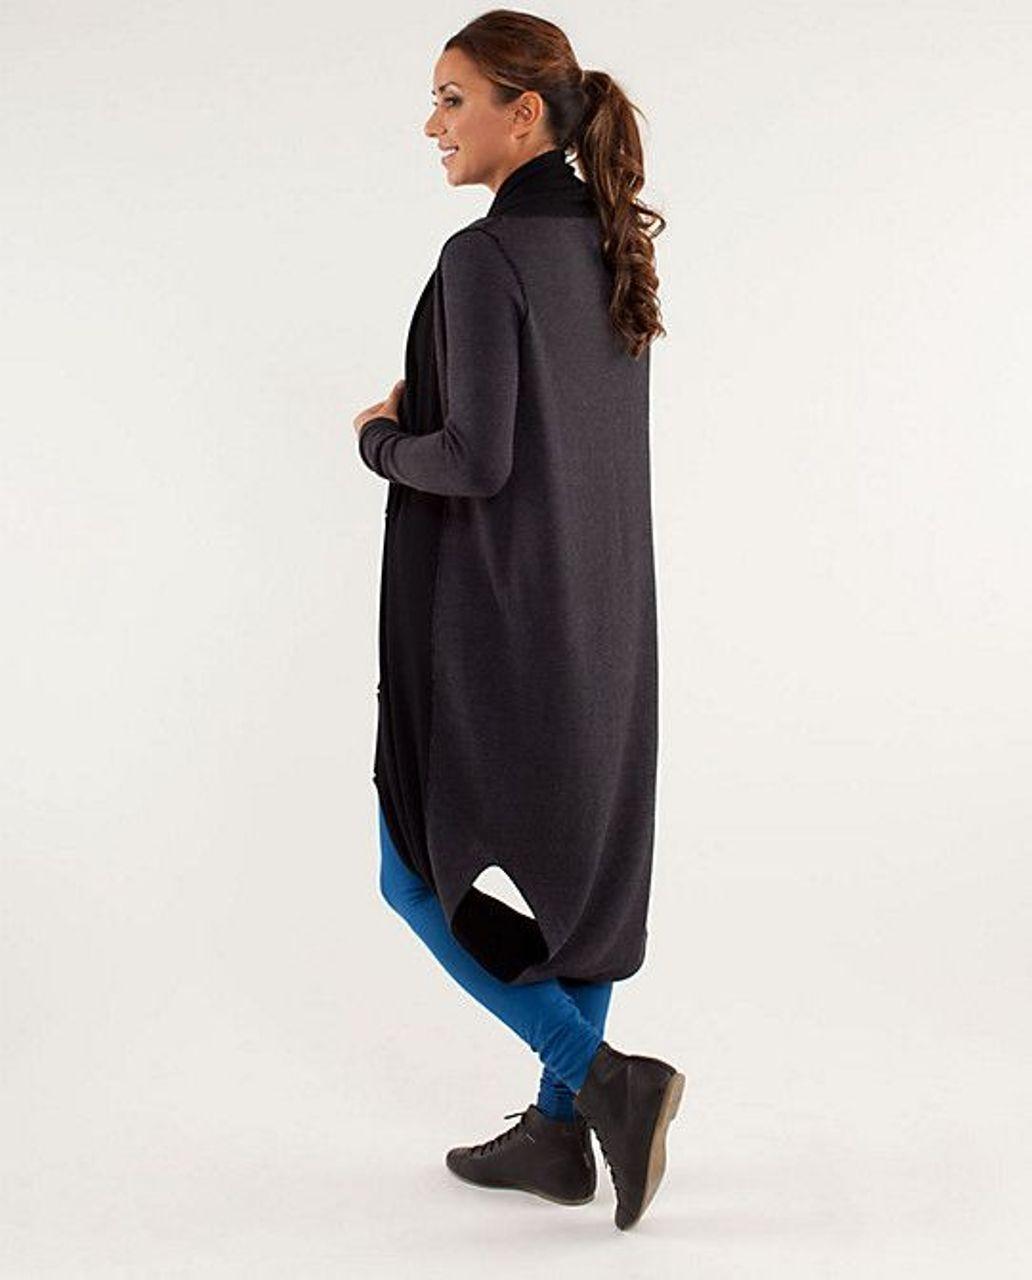 Lululemon Intuition Sweater Wrap - Black / Slope Stripe Black Coal